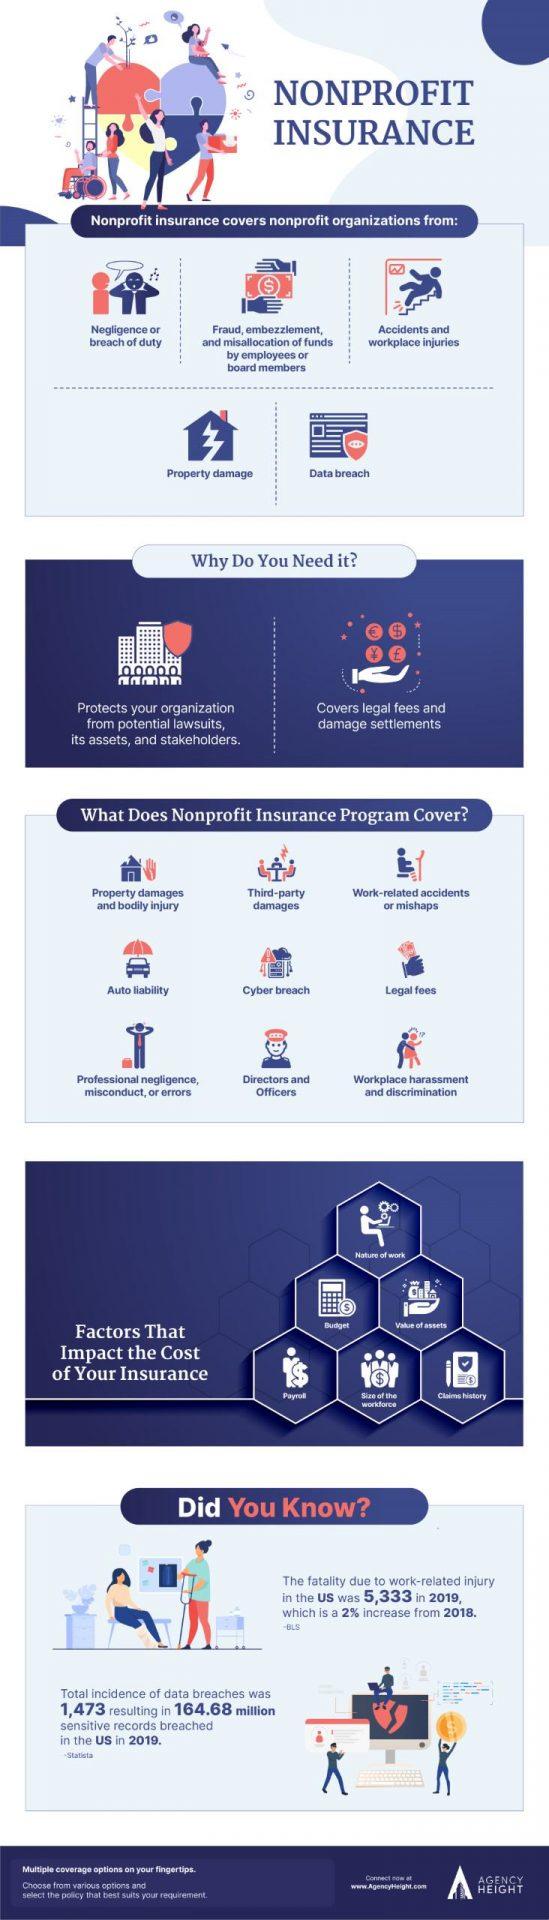 infographic non profit insurance